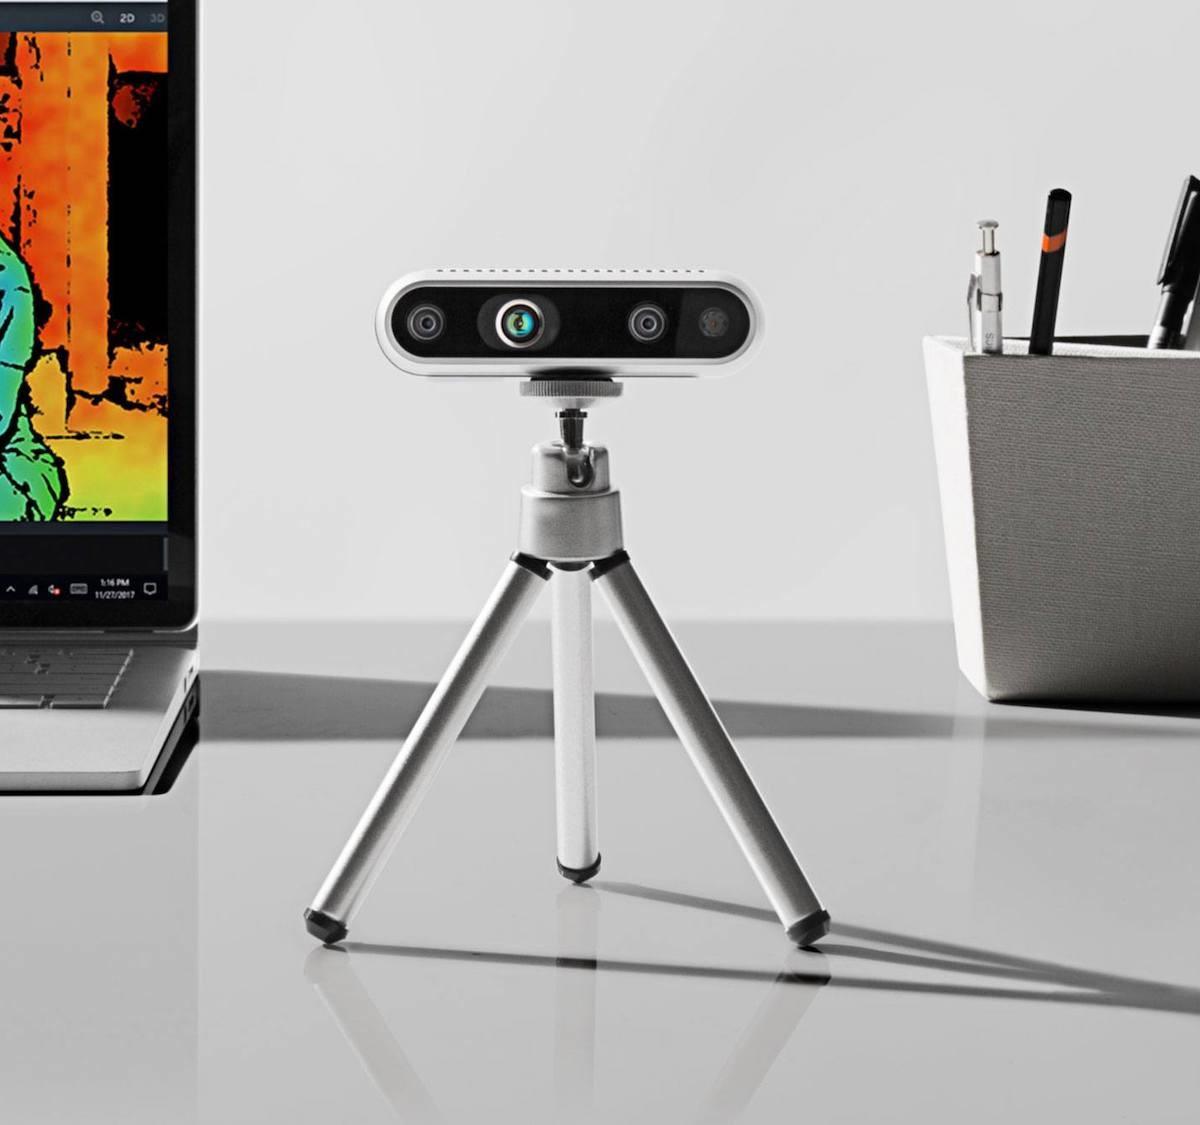 Intel RealSense D455 Depth Camera offers impressive precision and accuracy